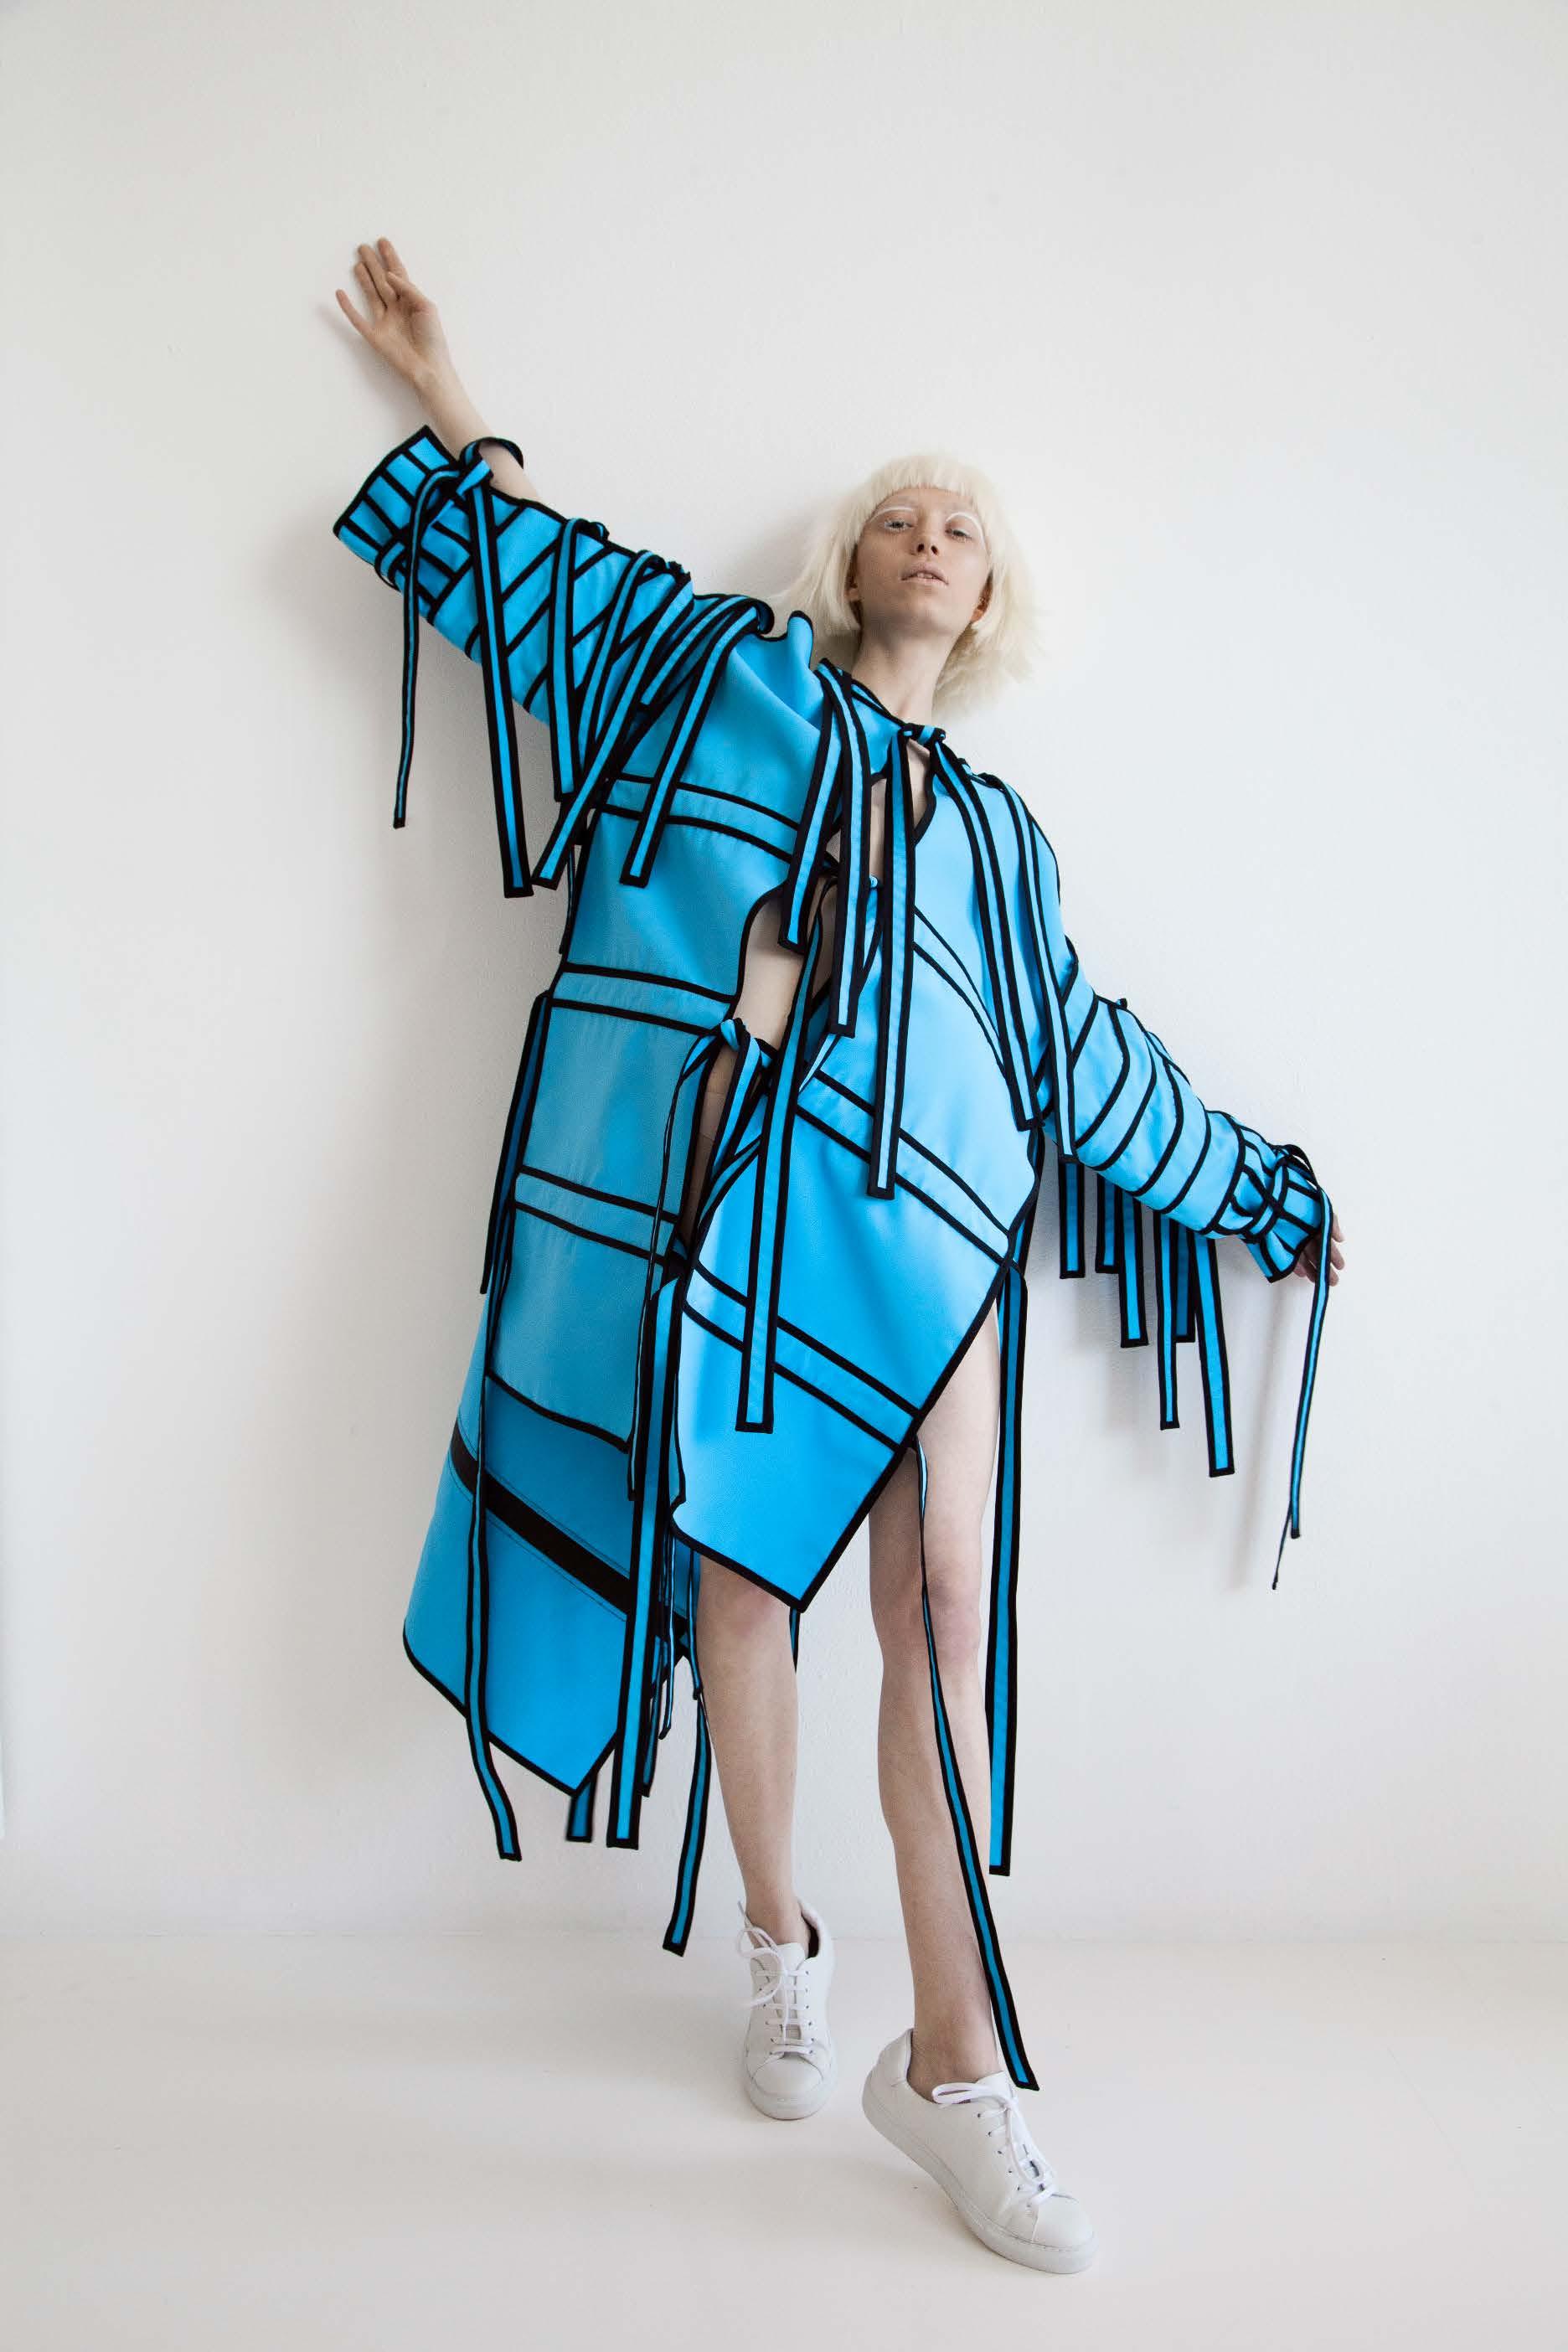 Sunny choi fashion designer 60